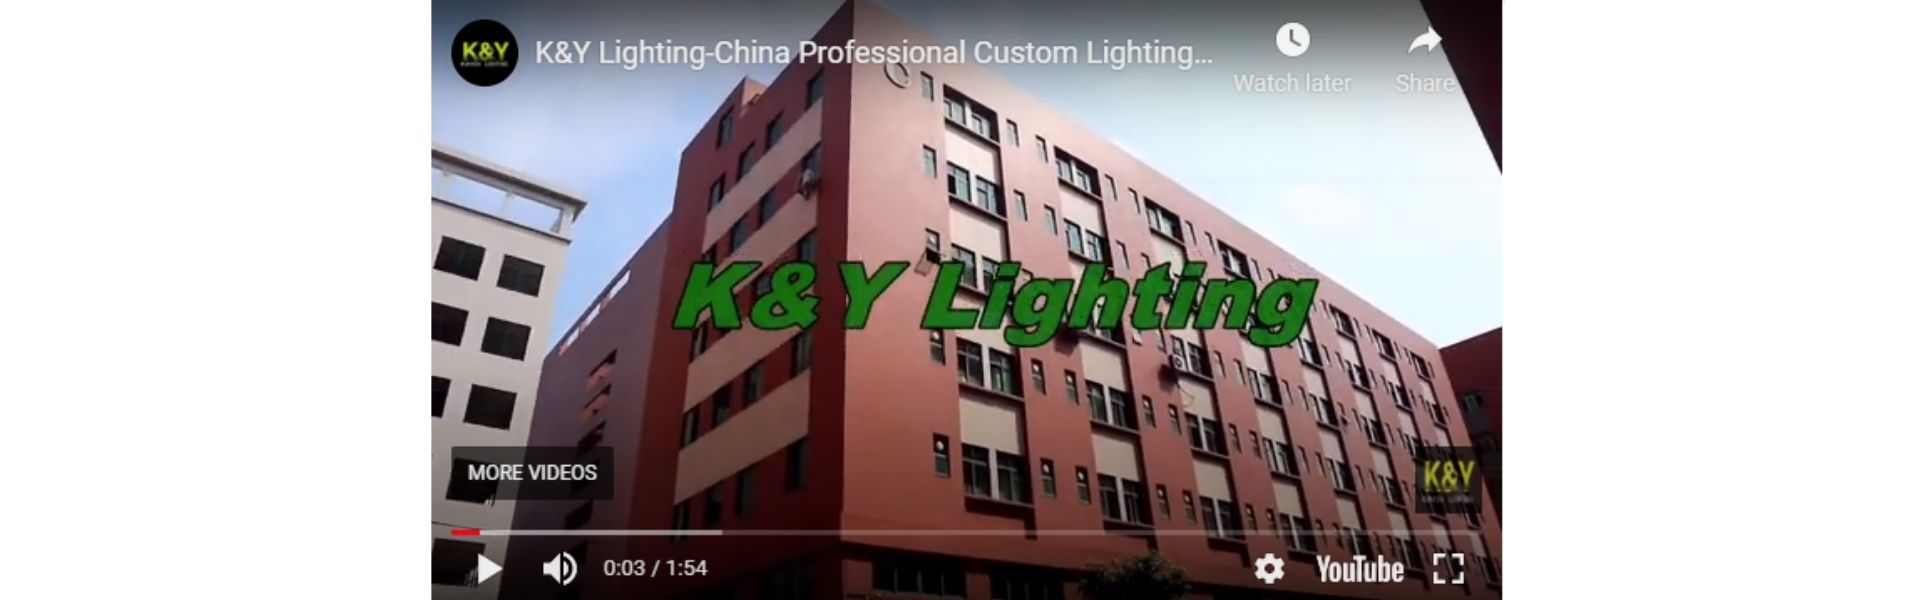 K&Y Lighting-Custom Lighting Mnufacturer